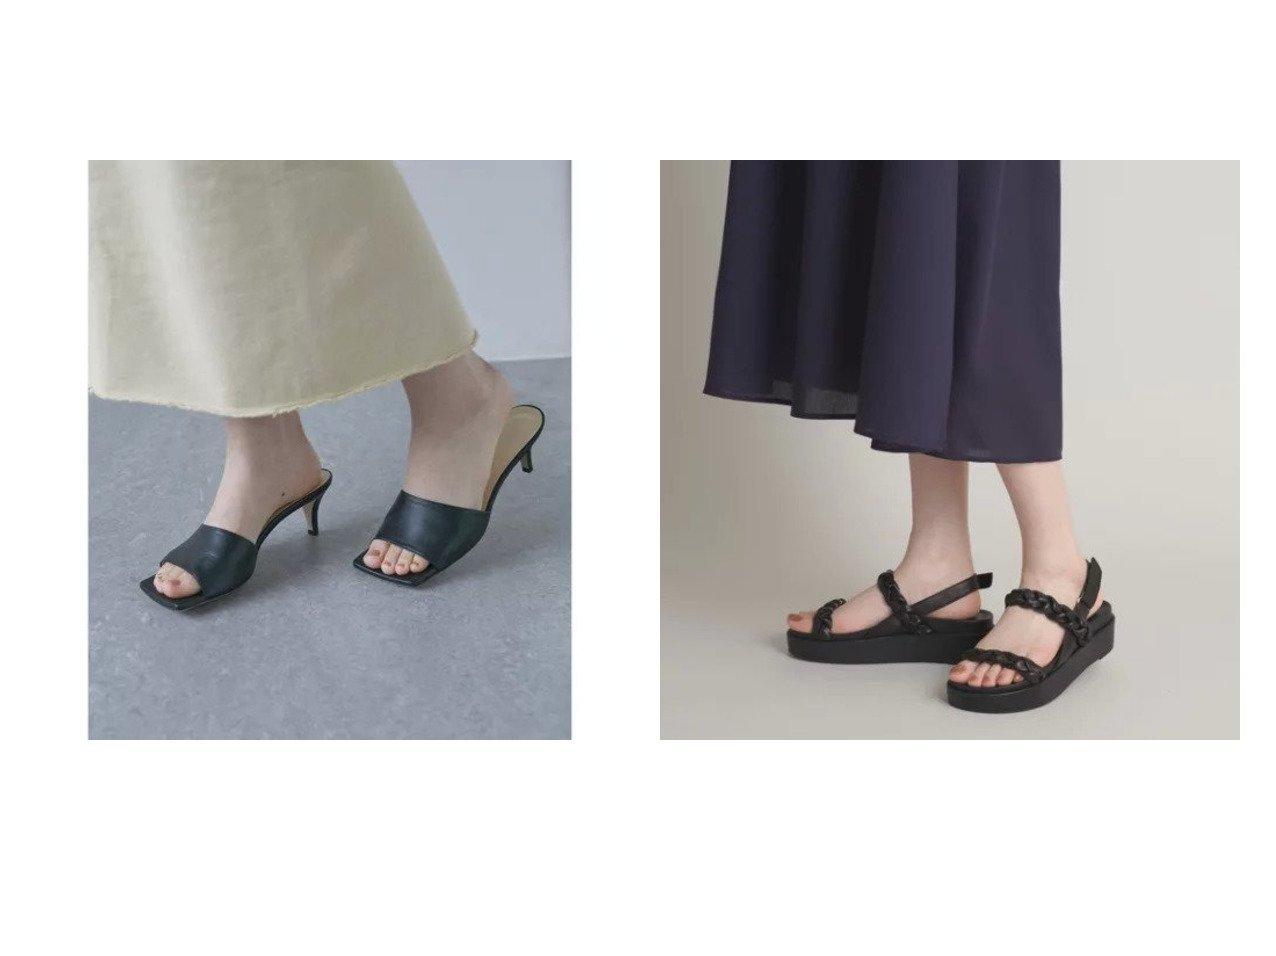 【GALLARDAGALANTE/ガリャルダガランテ】の【2.718】スクエアミュール&【Odette e Odile/オデット エ オディール】のOFD ブレイド サンダル40 【シューズ・靴】おすすめ!人気、トレンド・レディースファッションの通販 おすすめで人気の流行・トレンド、ファッションの通販商品 メンズファッション・キッズファッション・インテリア・家具・レディースファッション・服の通販 founy(ファニー) https://founy.com/ ファッション Fashion レディースファッション WOMEN インソール サンダル シューズ 厚底 シルク シンプル ソックス トレンド パイソン ベーシック ロング ワイド おすすめ Recommend  ID:crp329100000030395